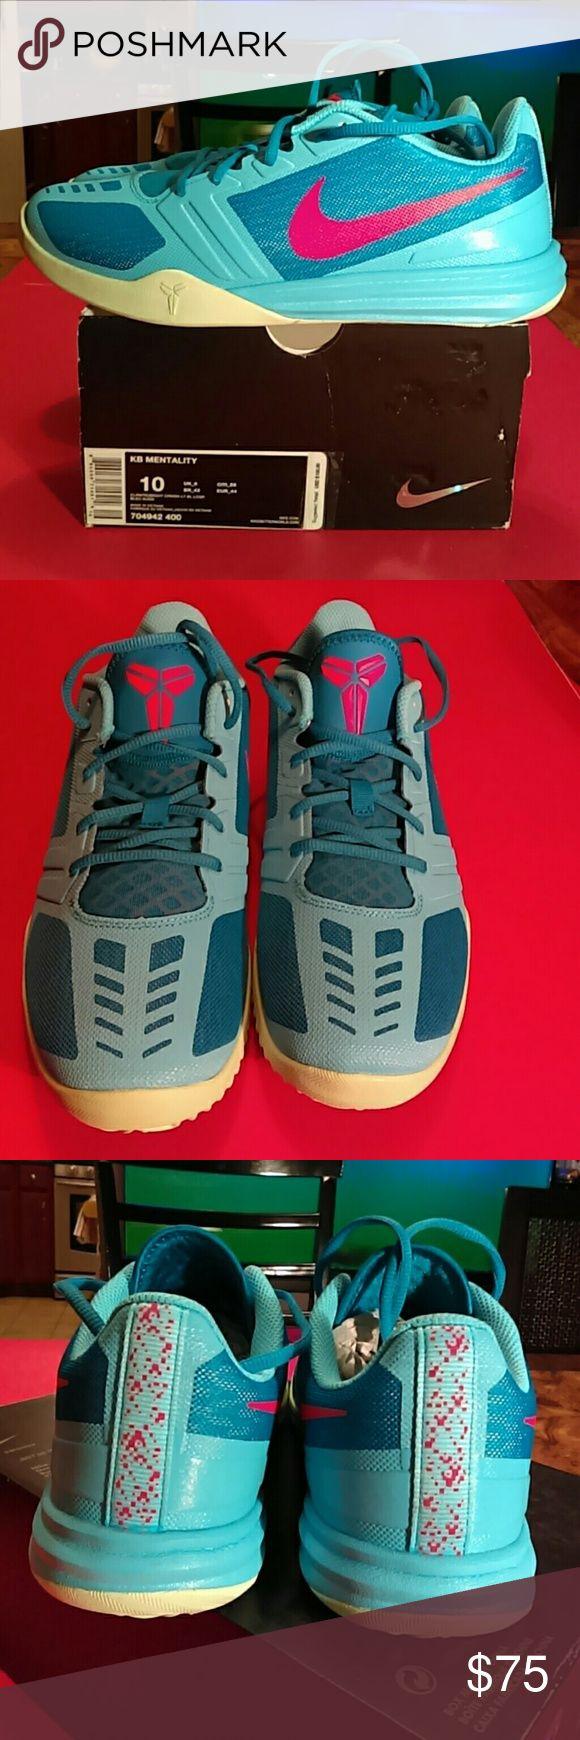 BRAND New  NIKE KOBE  Men  sneaker Nike   KOBE    Mentality     Unisex. Men 10 women 11.5.                                                                                                Super comfy Color: clear water/bright crimson/light blue Nike Shoes Sneakers